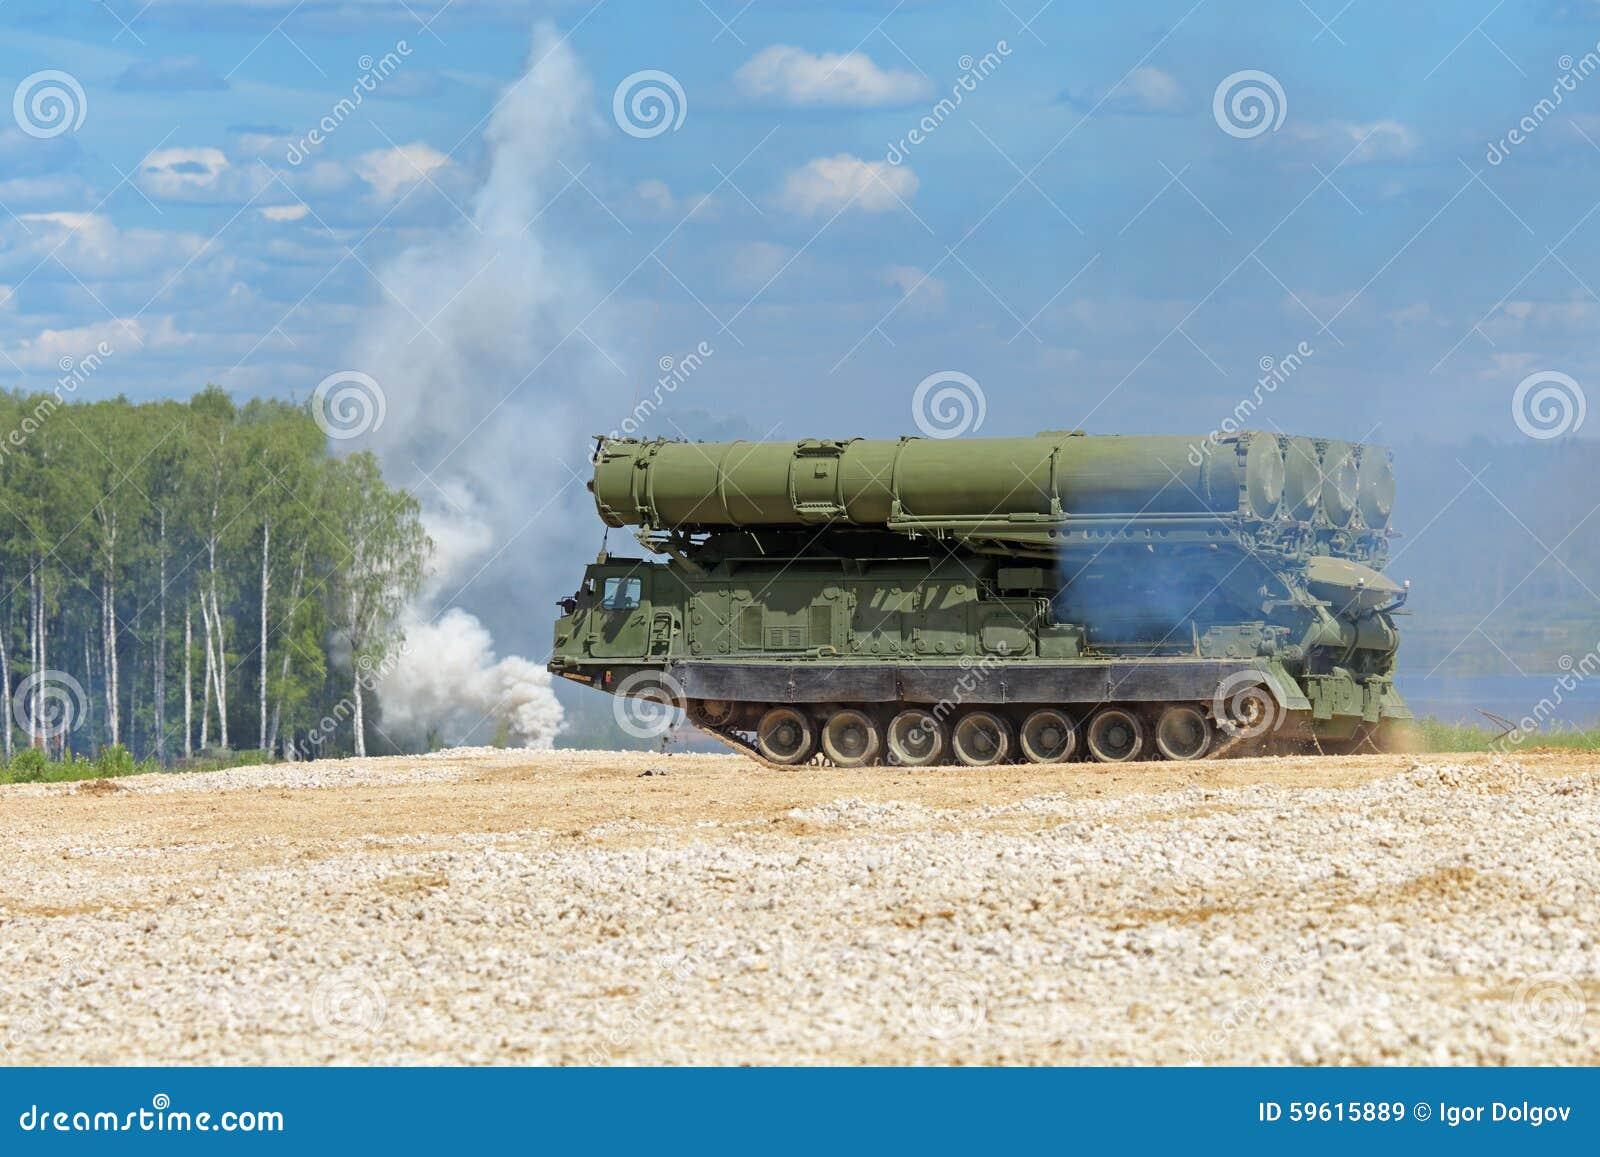 Antiaircraft missiles stock image. Image of gantry ...